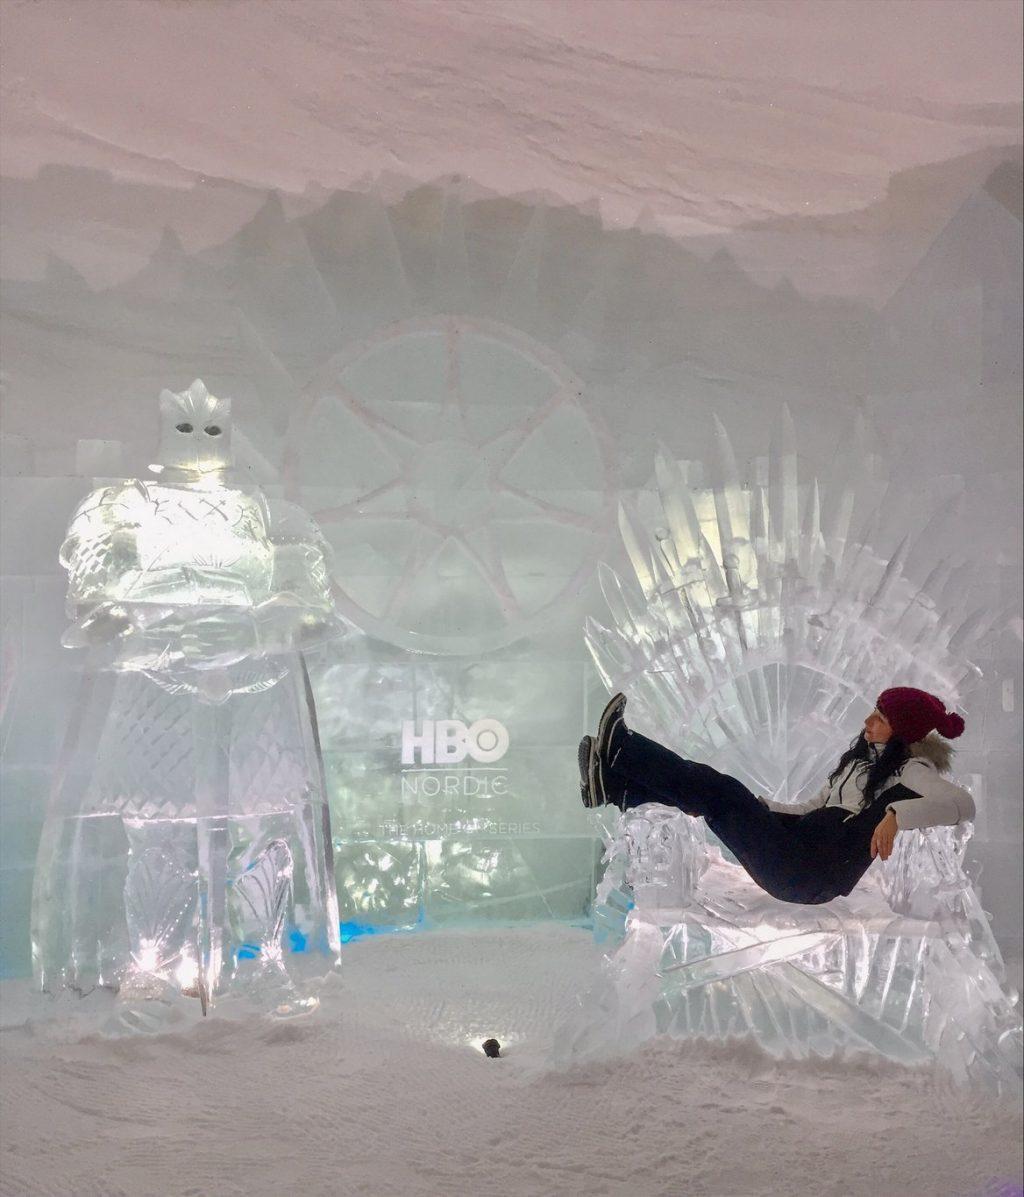 Game-of-Thrones-SnowVillage-Finnland